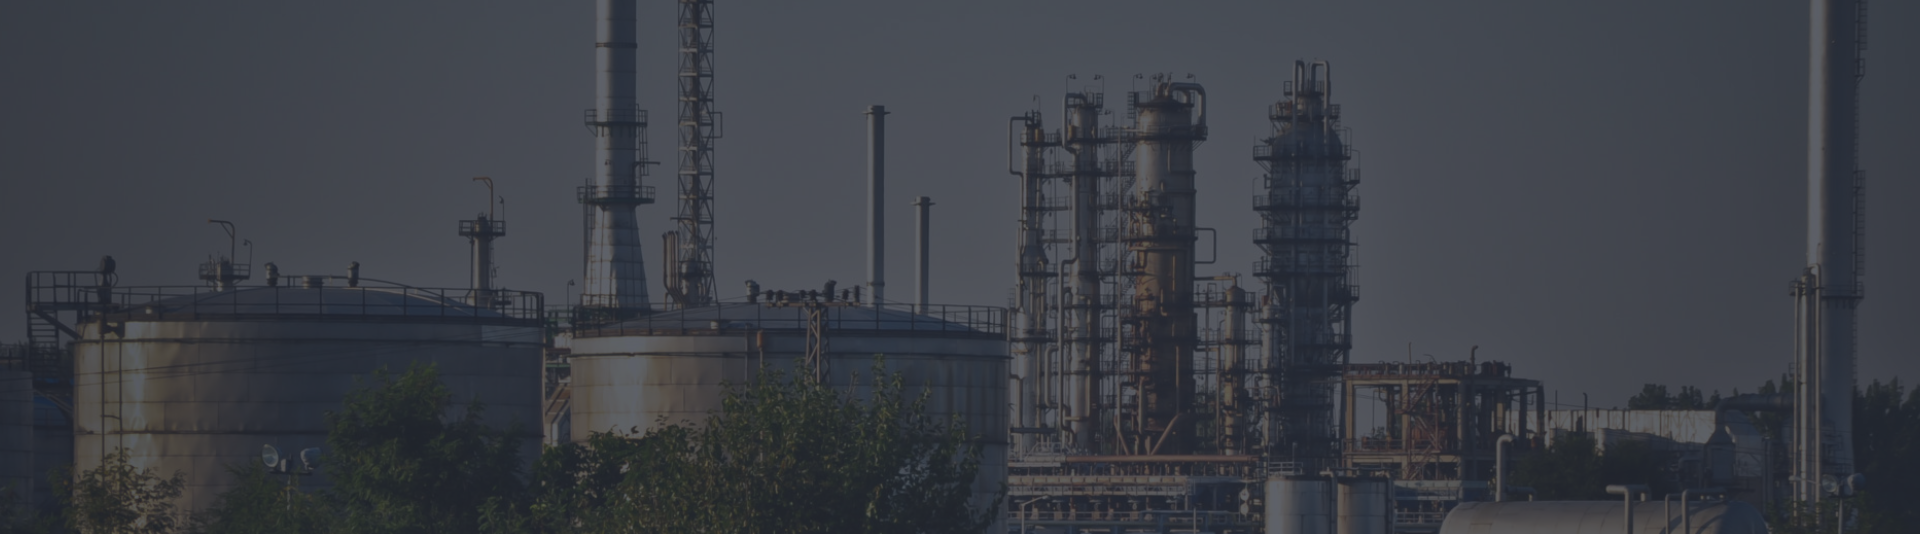 gasoline plant